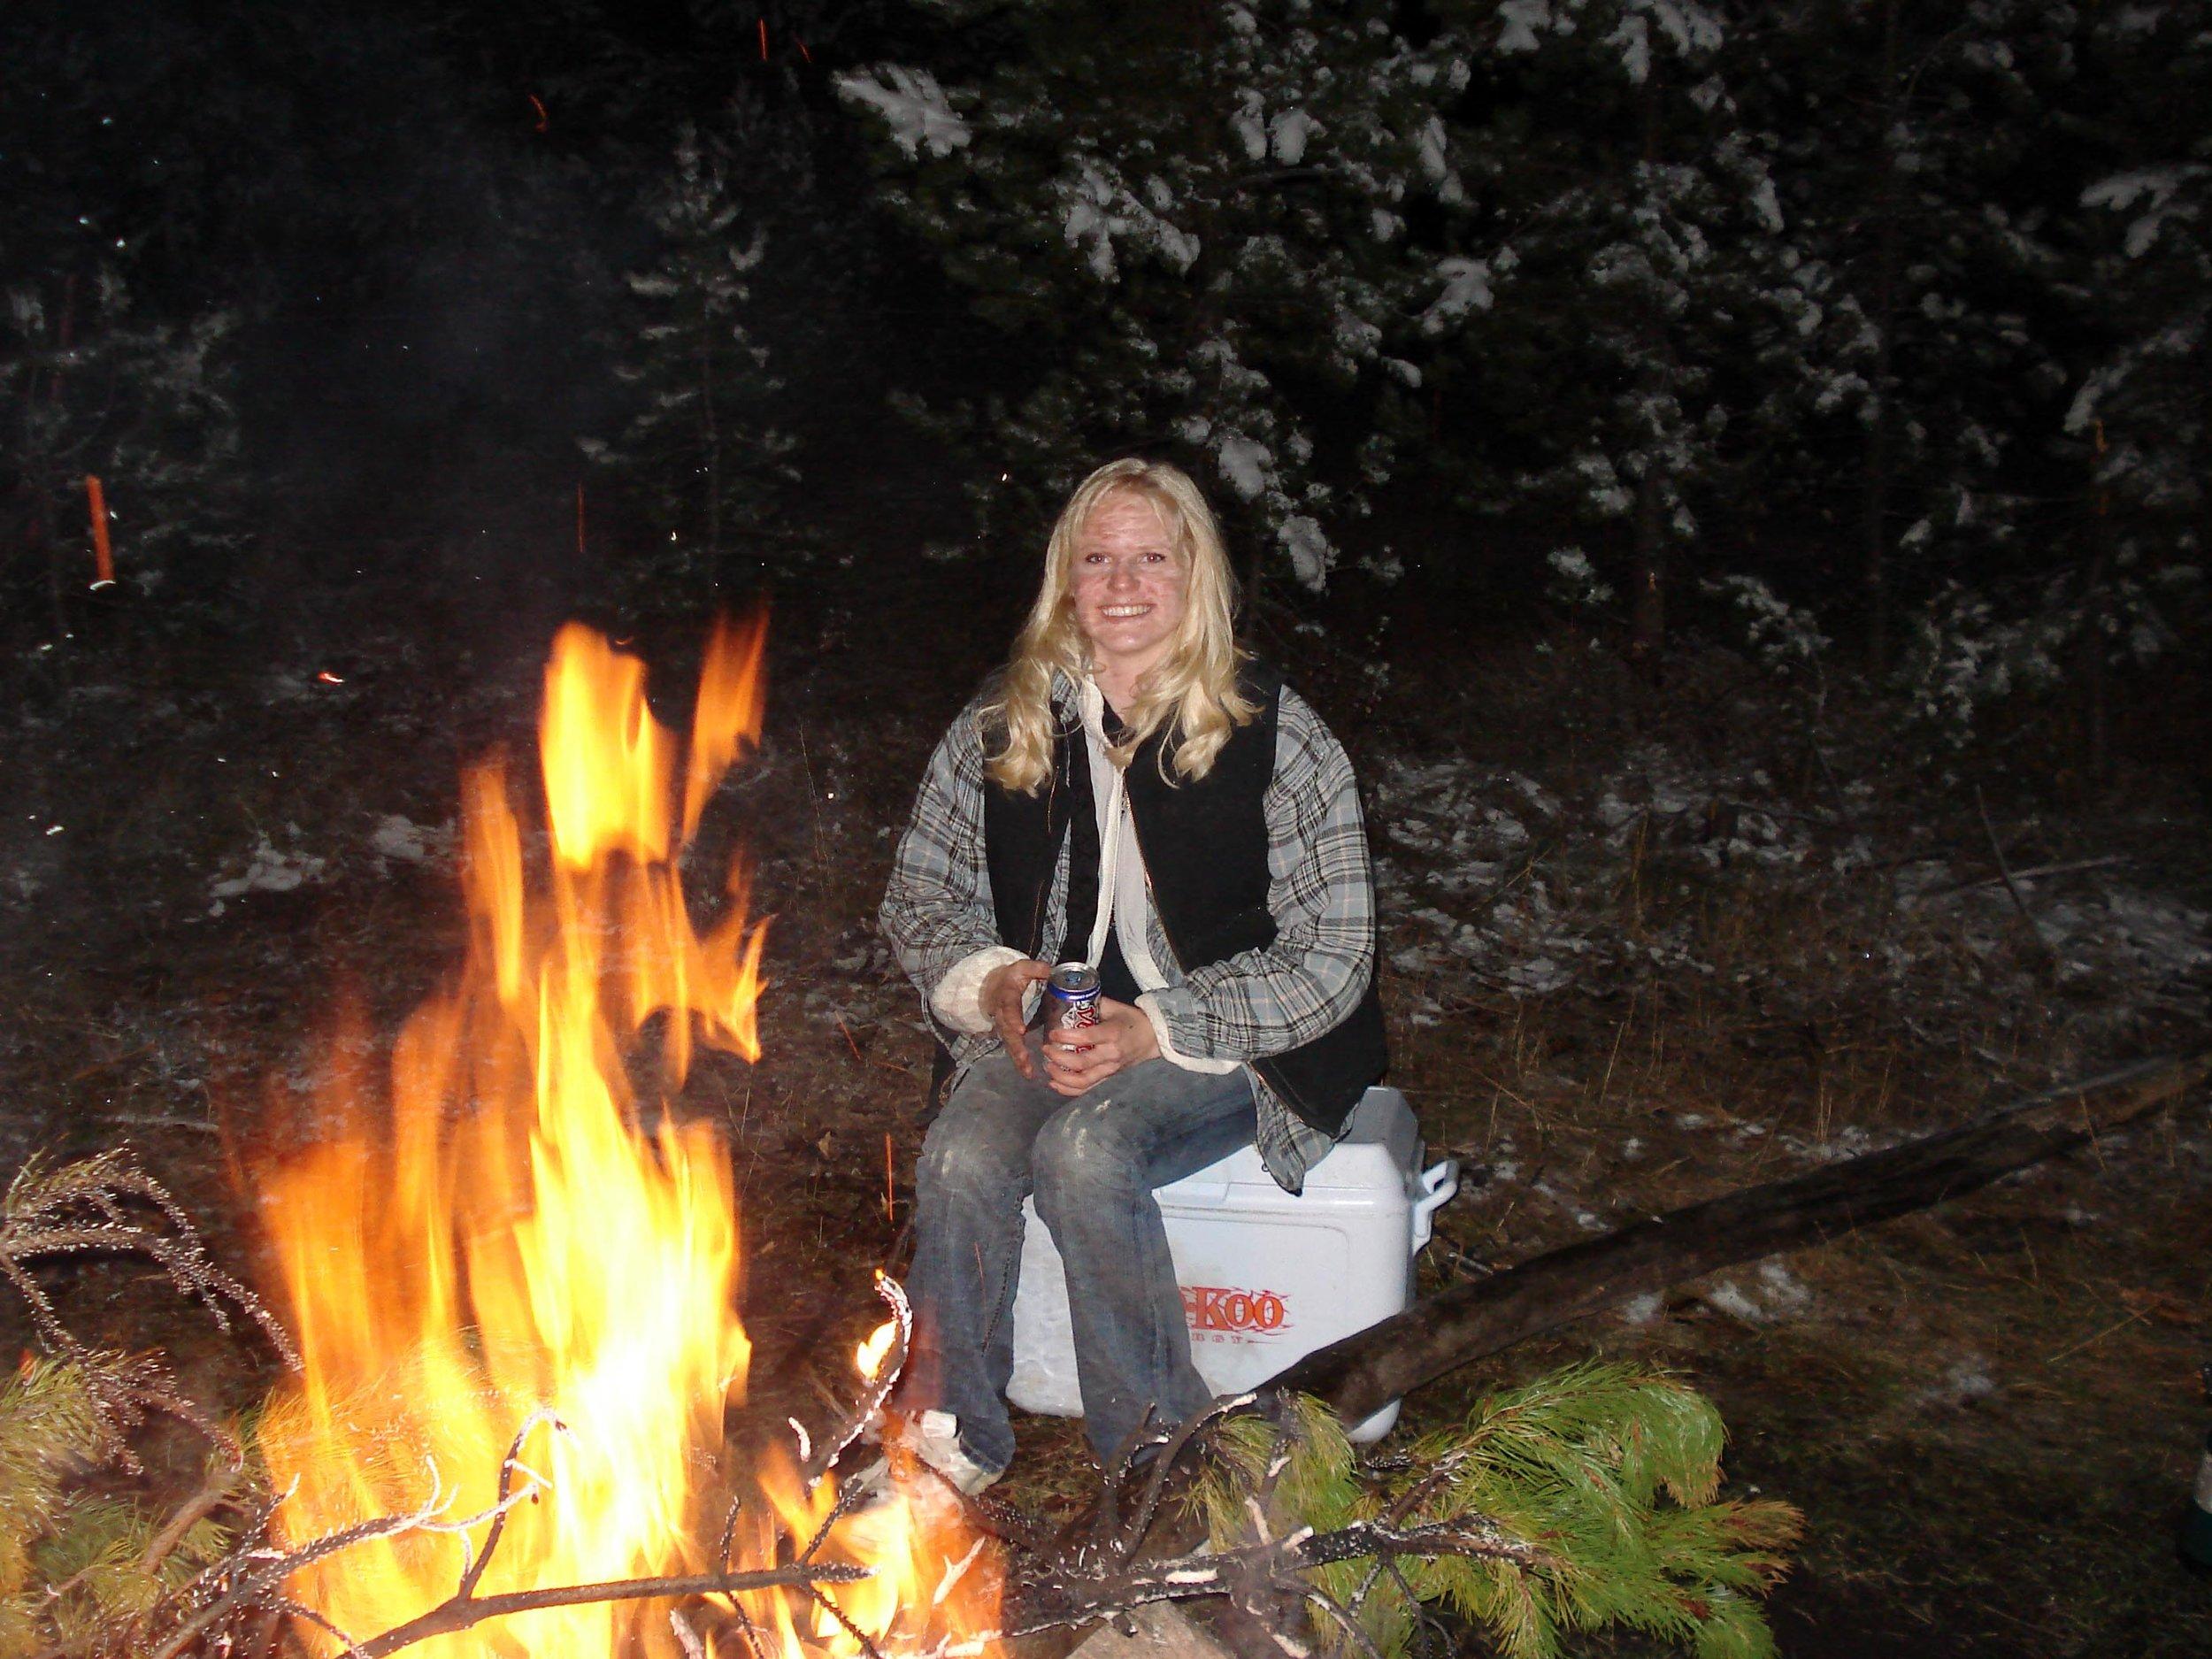 Camping at Hyalite Reservoir near Bozeman, Montana in September.